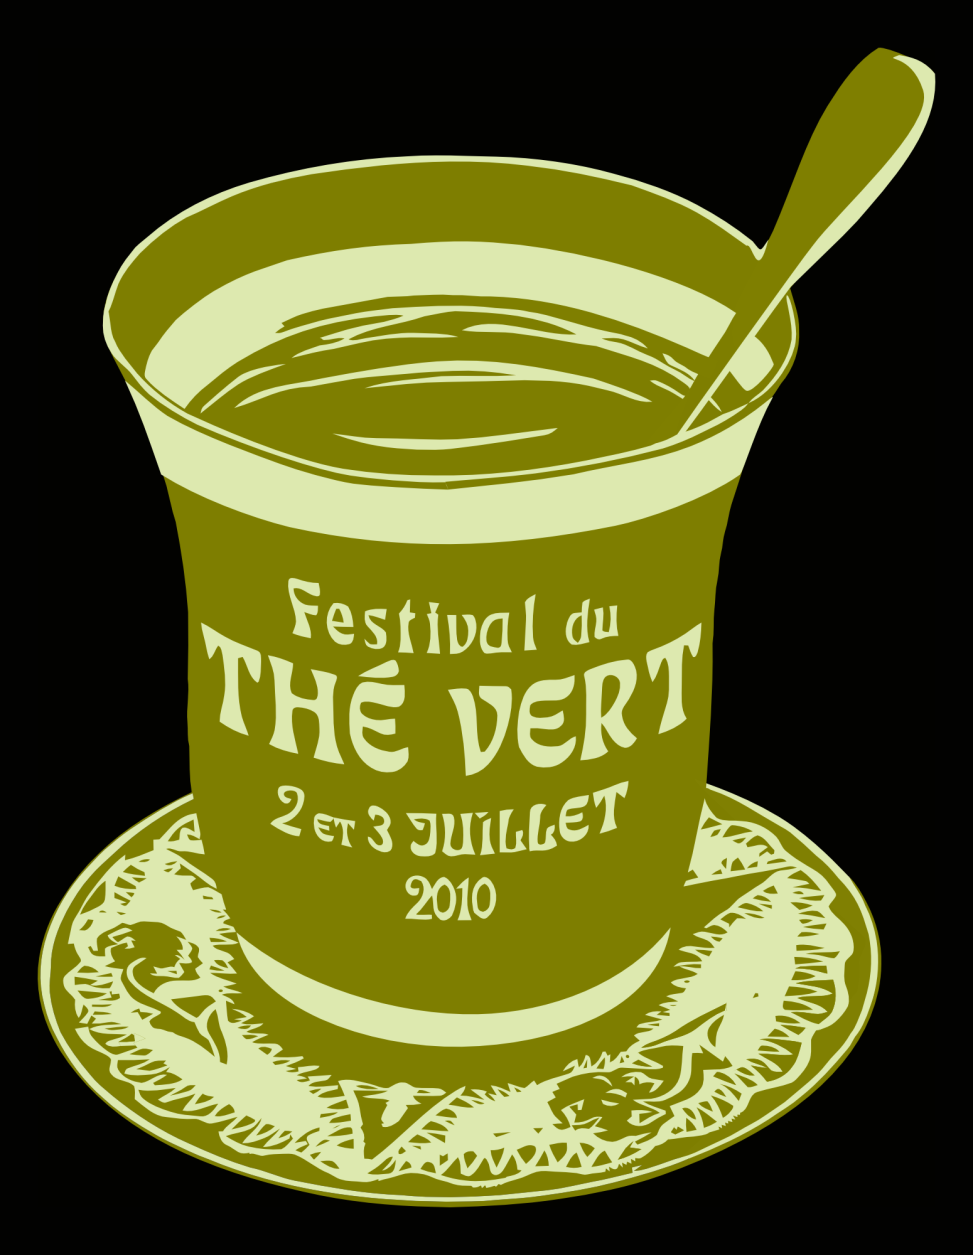 Festival du Thé Vert 2010 - Front T-Shirt